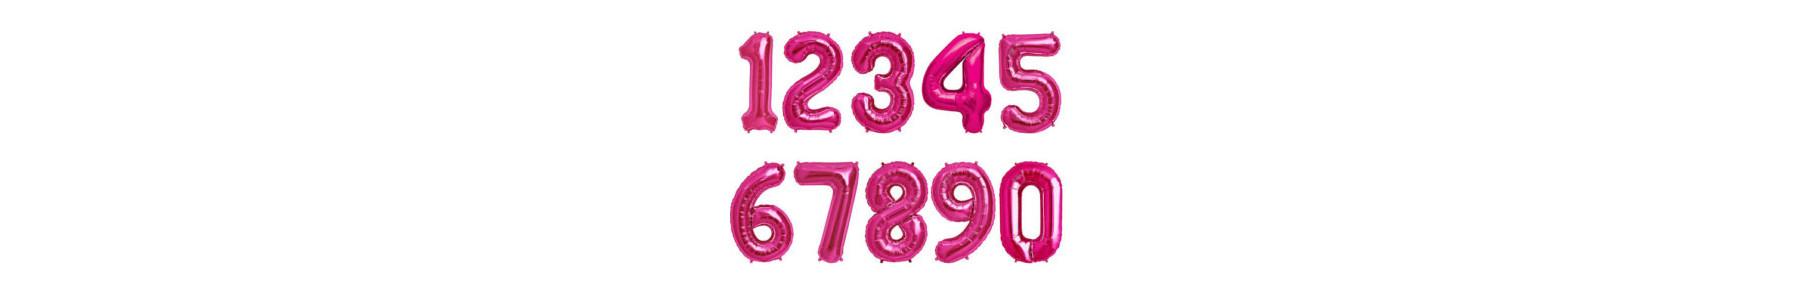 Baloane folie figurine cifre fuchsia